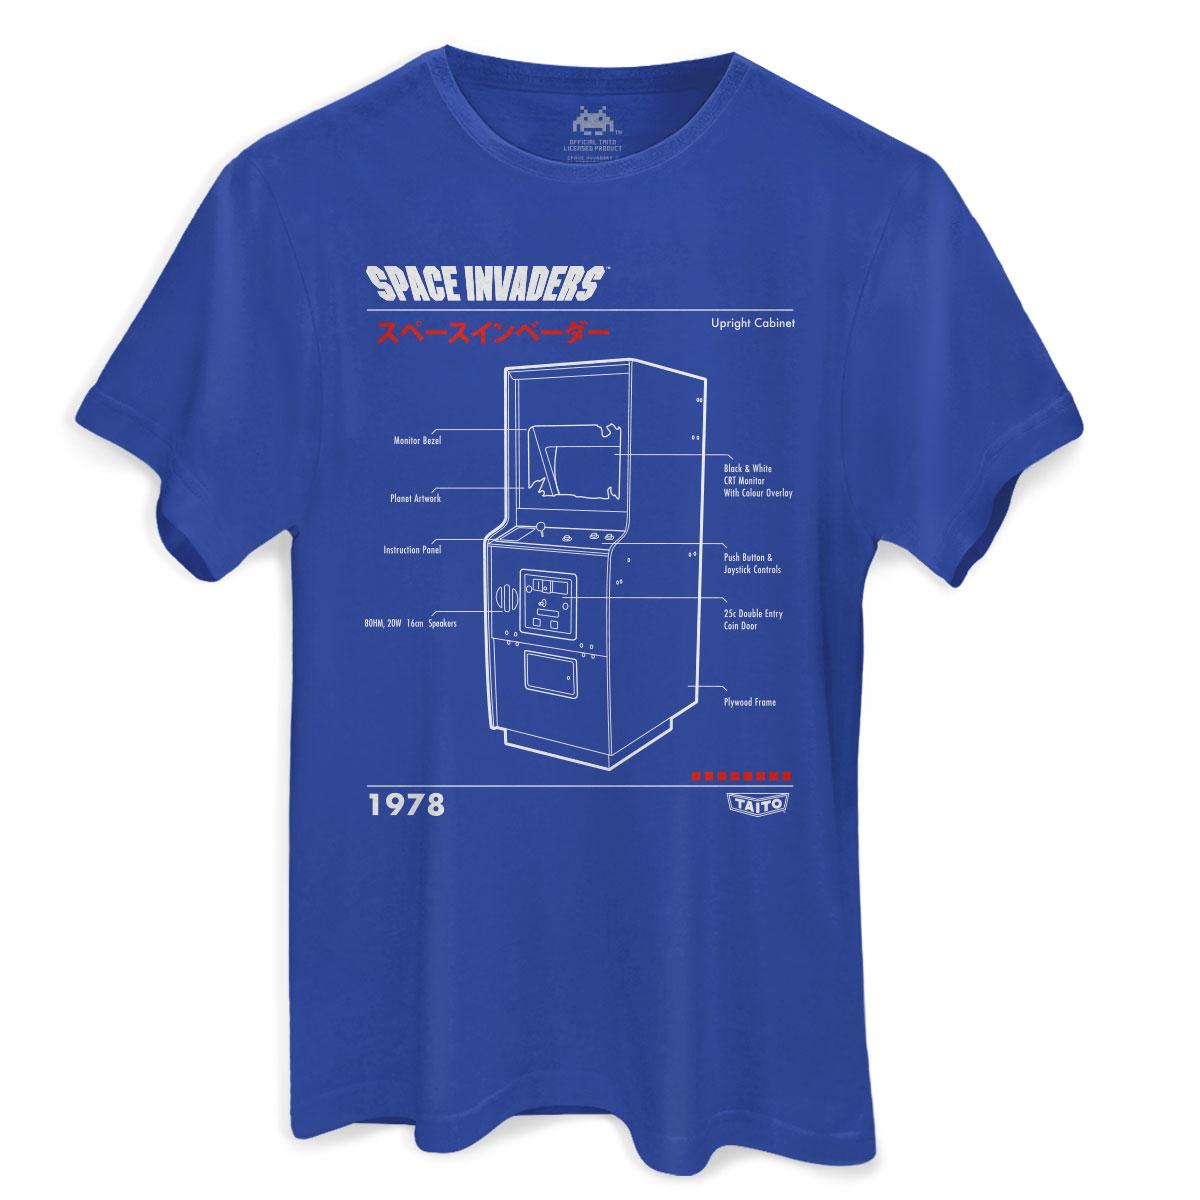 Camiseta Masculina Space Invaders Upright Cabinet Blue  - bandUP Store Marketplace